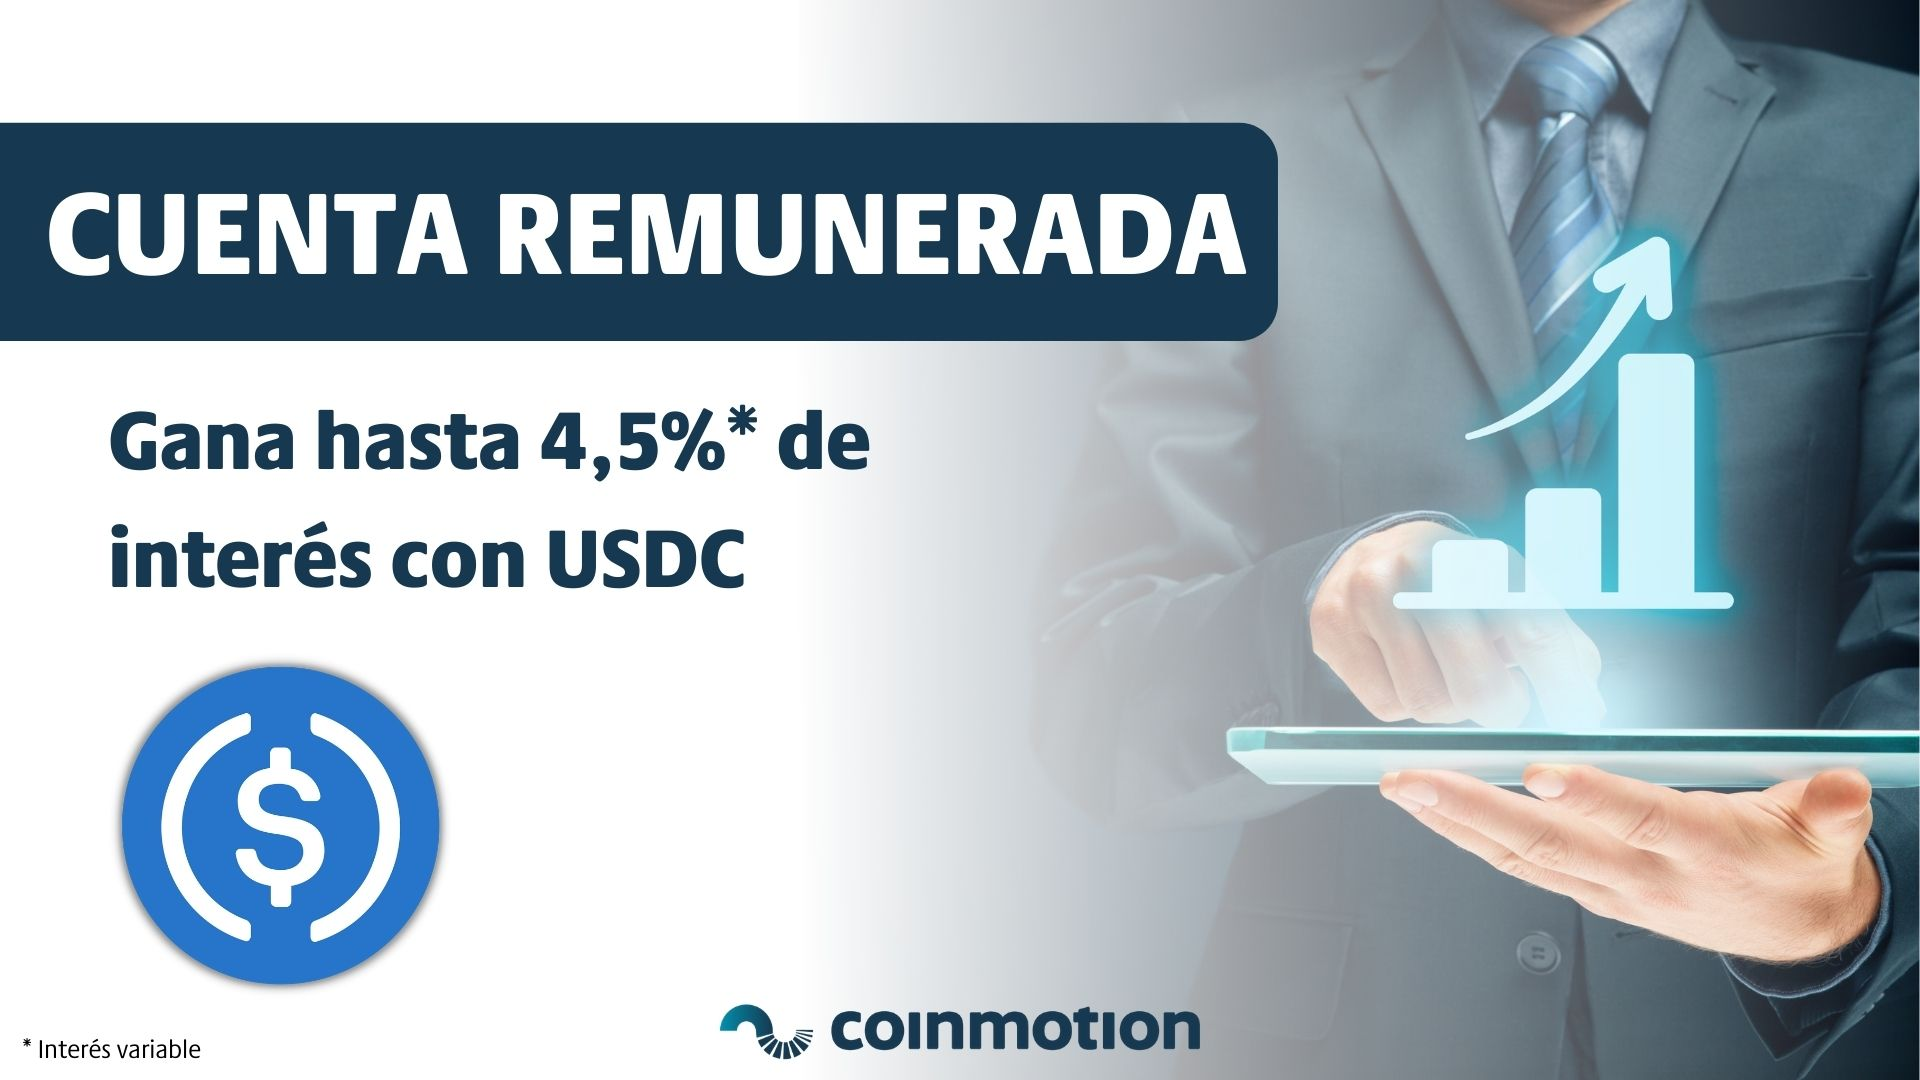 Cuenta remunerada USDC 4,5% interés anual Coinmotion